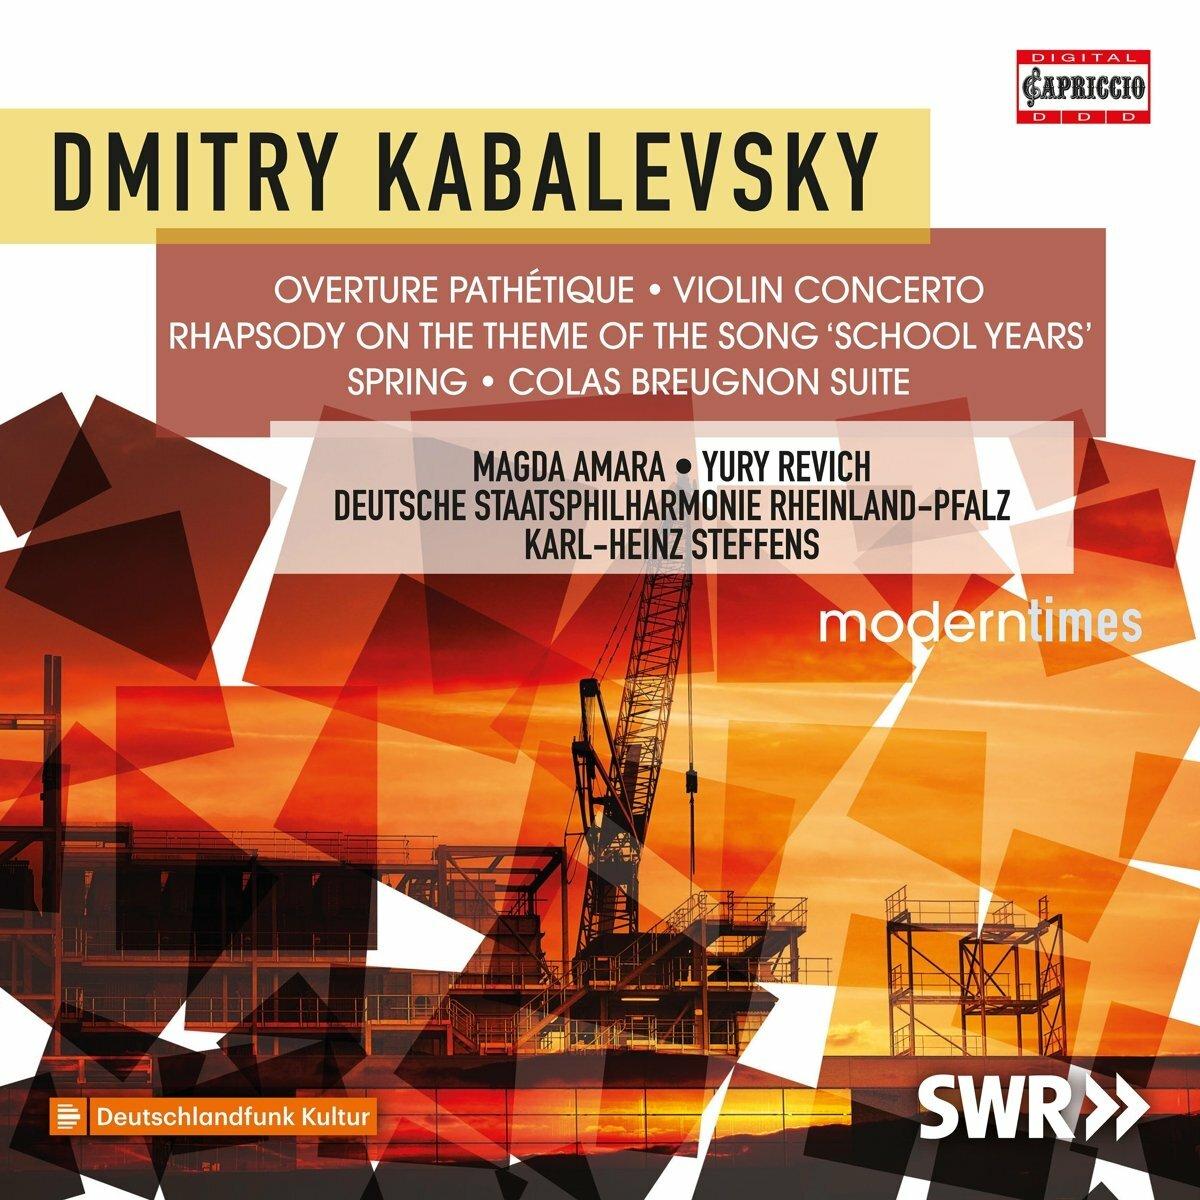 KABALEVSKY, D.B.: Pathétique Overture / Violin Concerto, Op. 48 / Vesna / Colas Breugnon